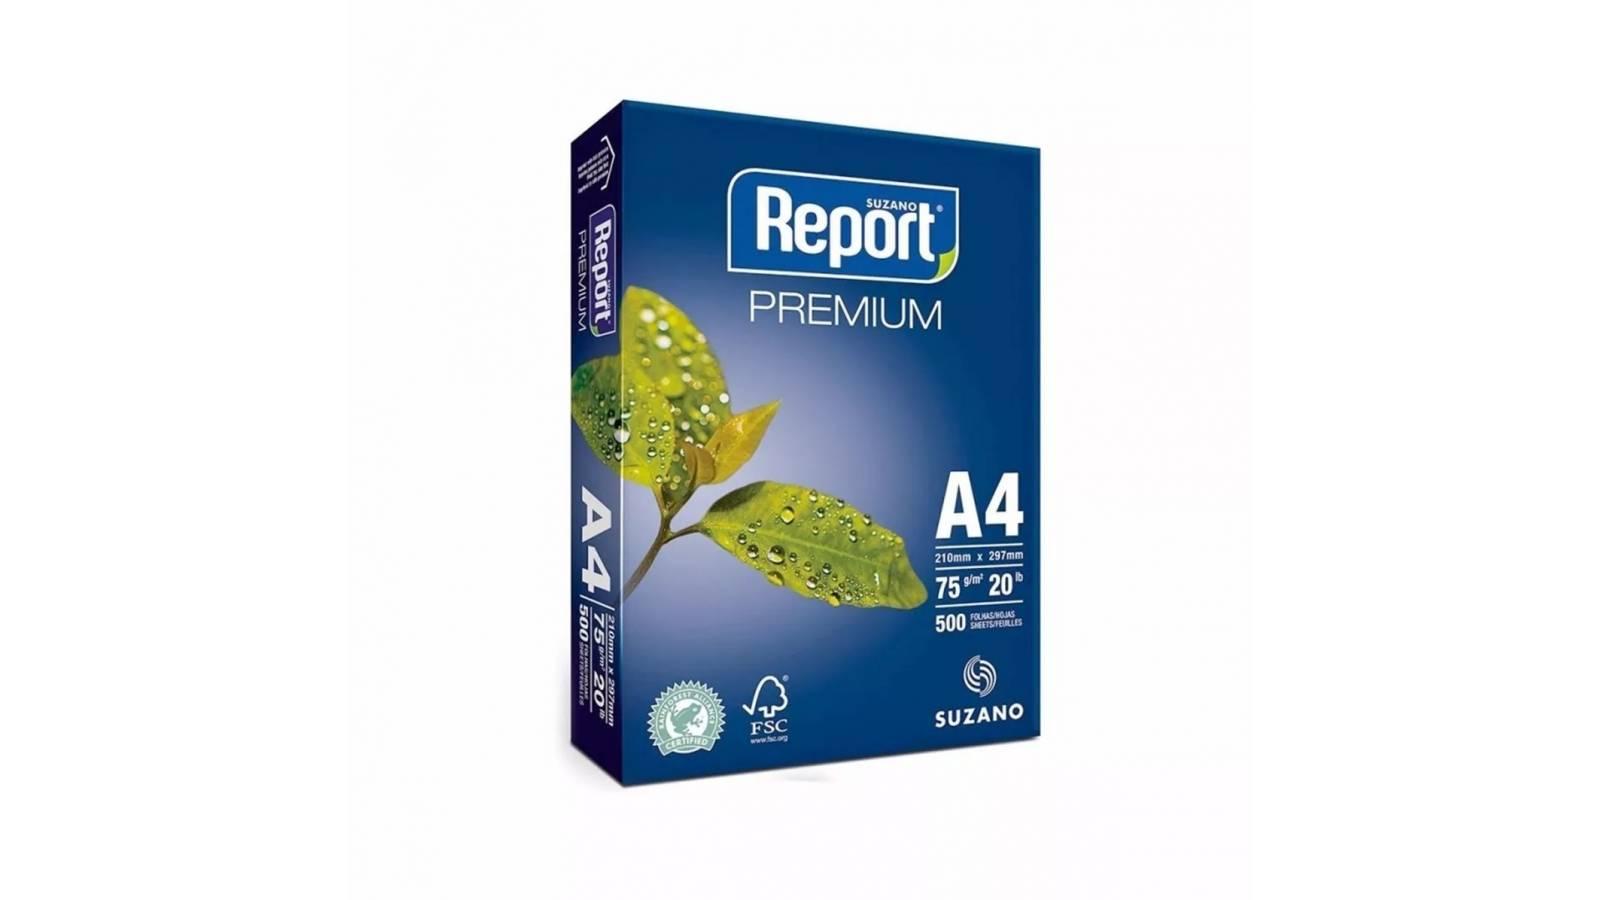 PAPEL A4 REPORT PREMIUM 500 H-75GS